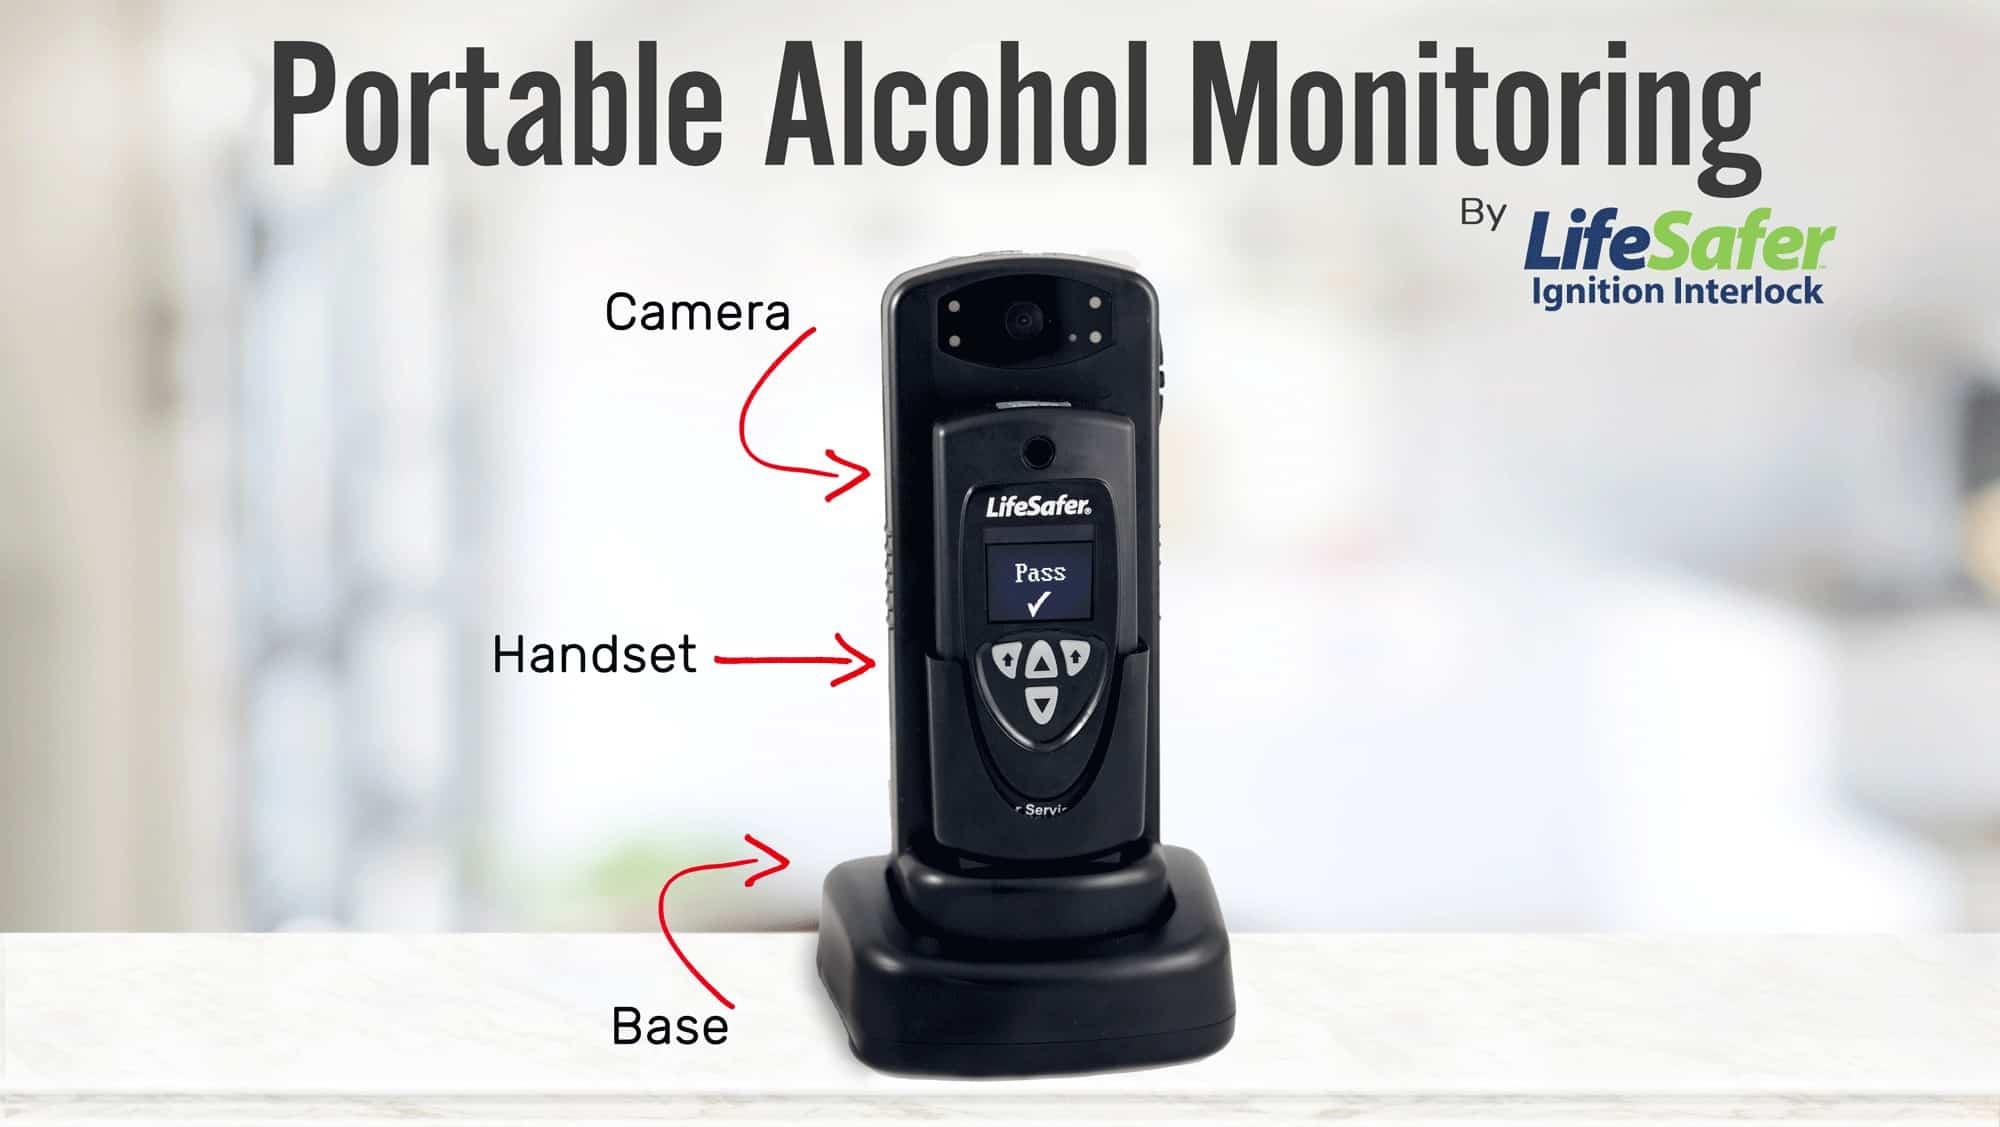 LifeSafer Portable Alcohol Monitoring